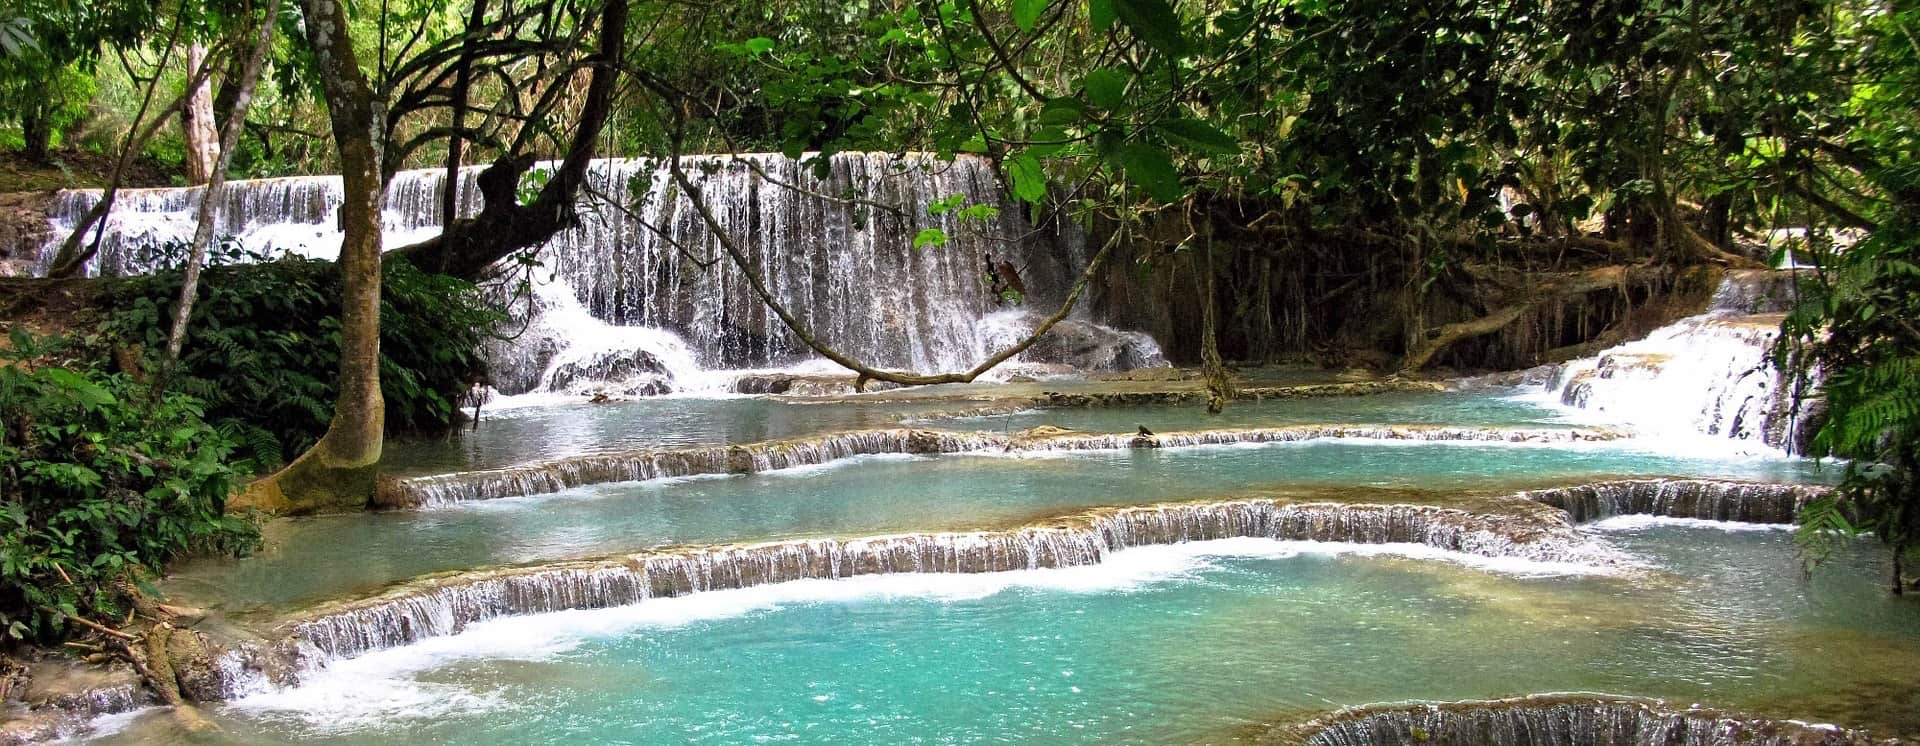 Watersfalls near Luang Prabang